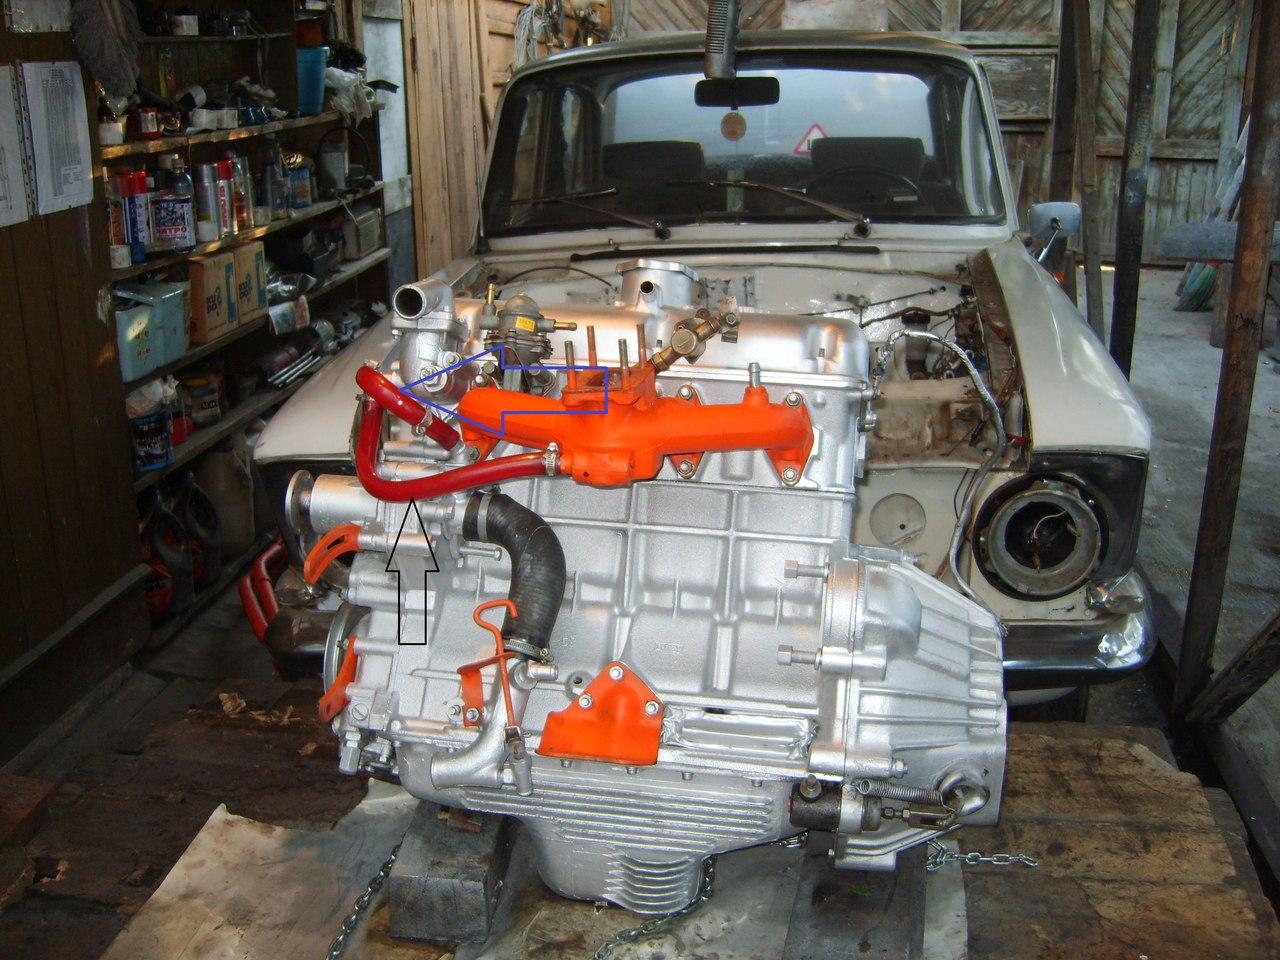 Ремонт двигателя москвича 412 своими руками 422